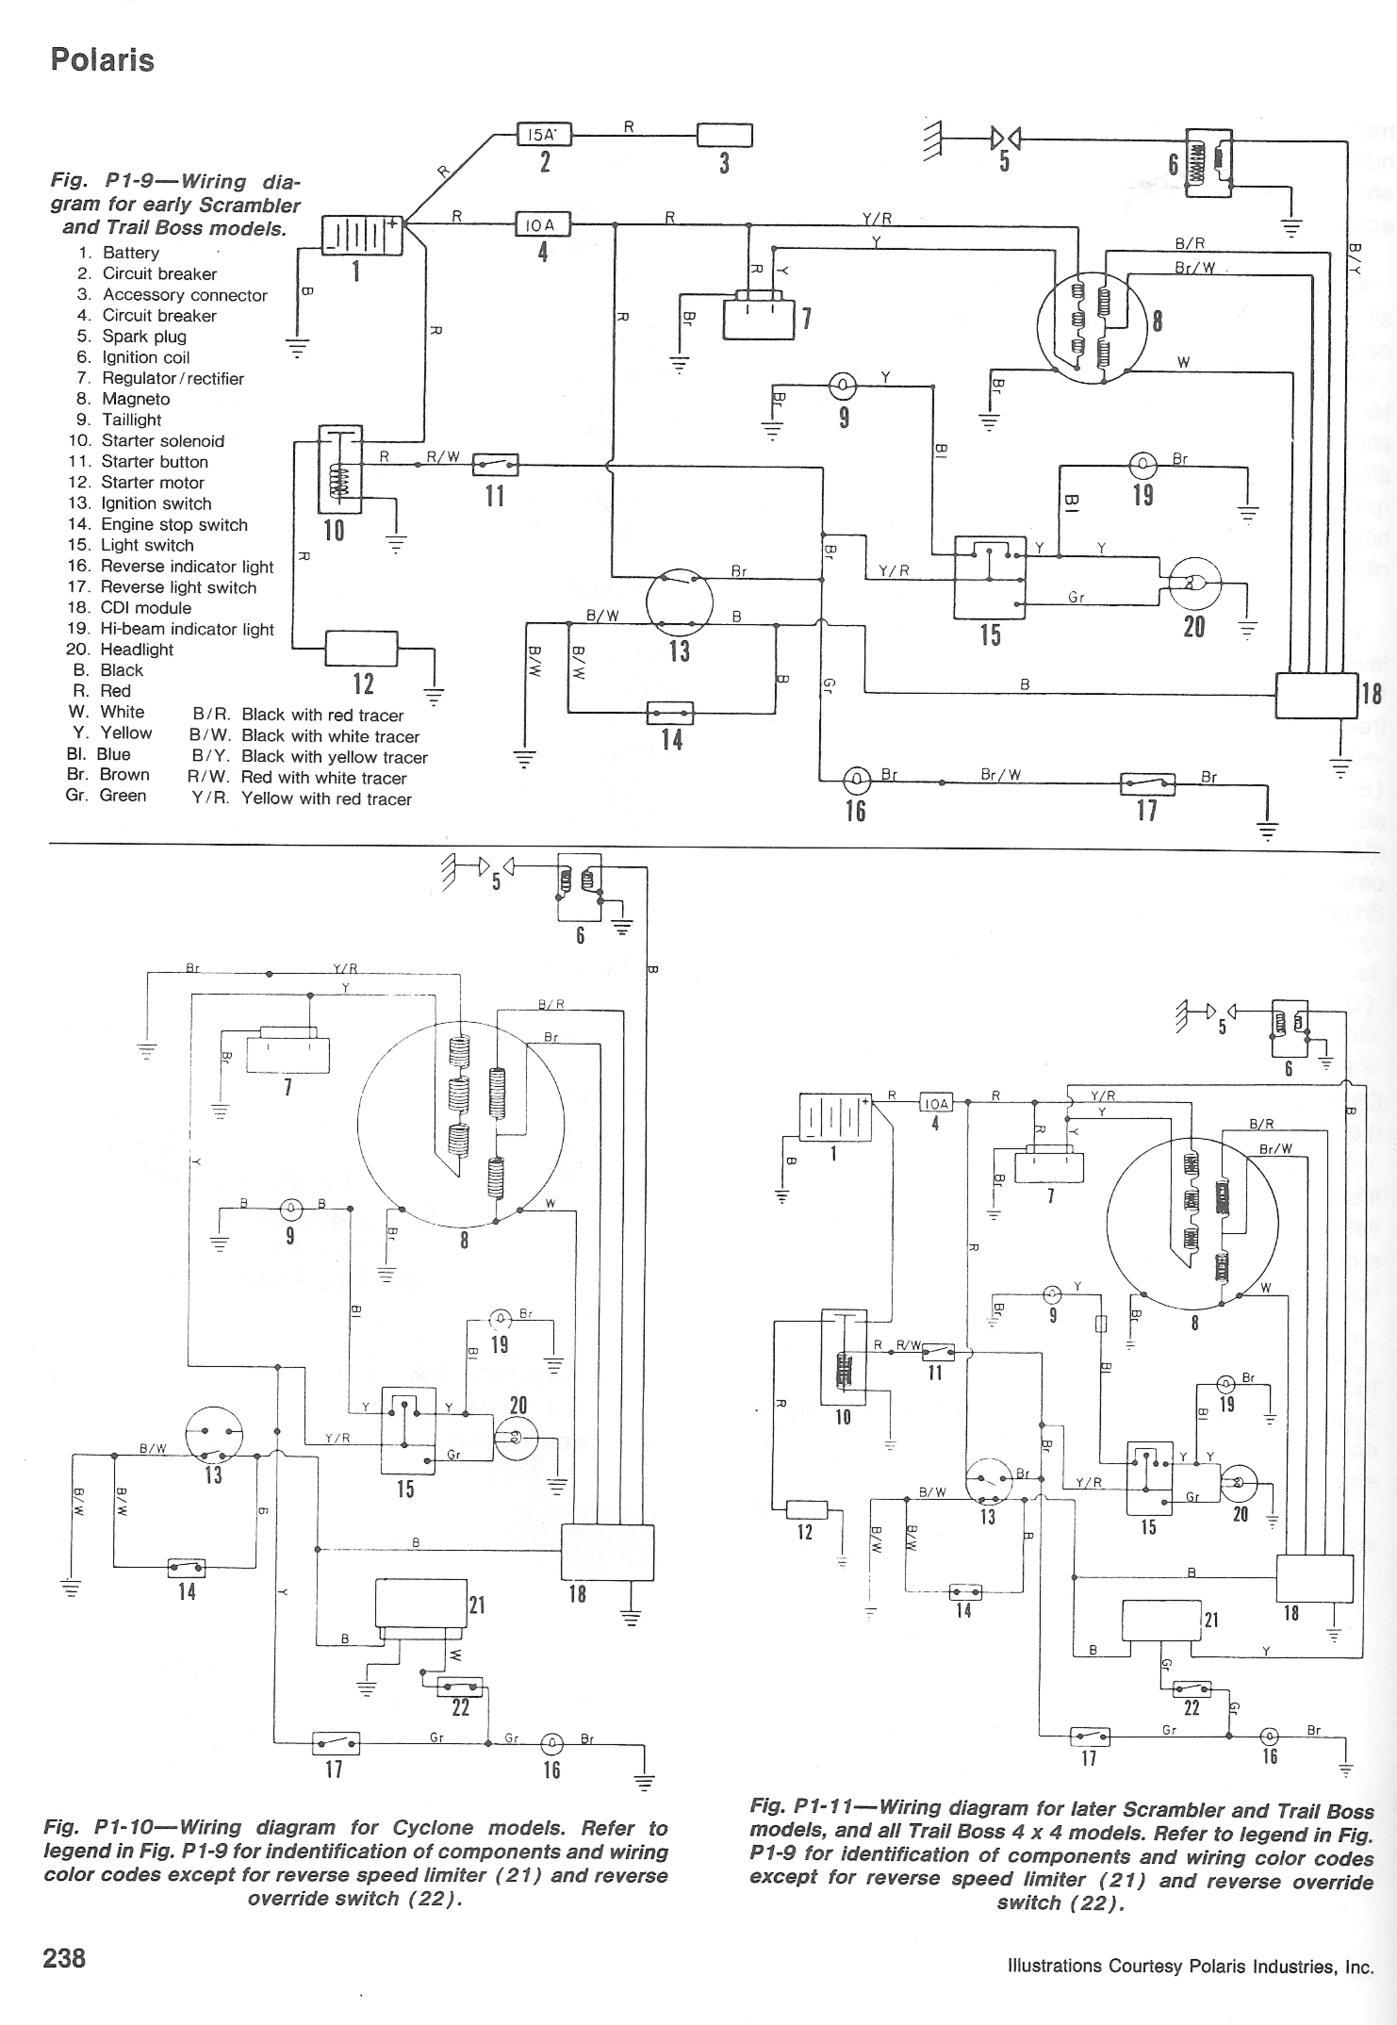 3wheeler world polaris scrambler. Black Bedroom Furniture Sets. Home Design Ideas